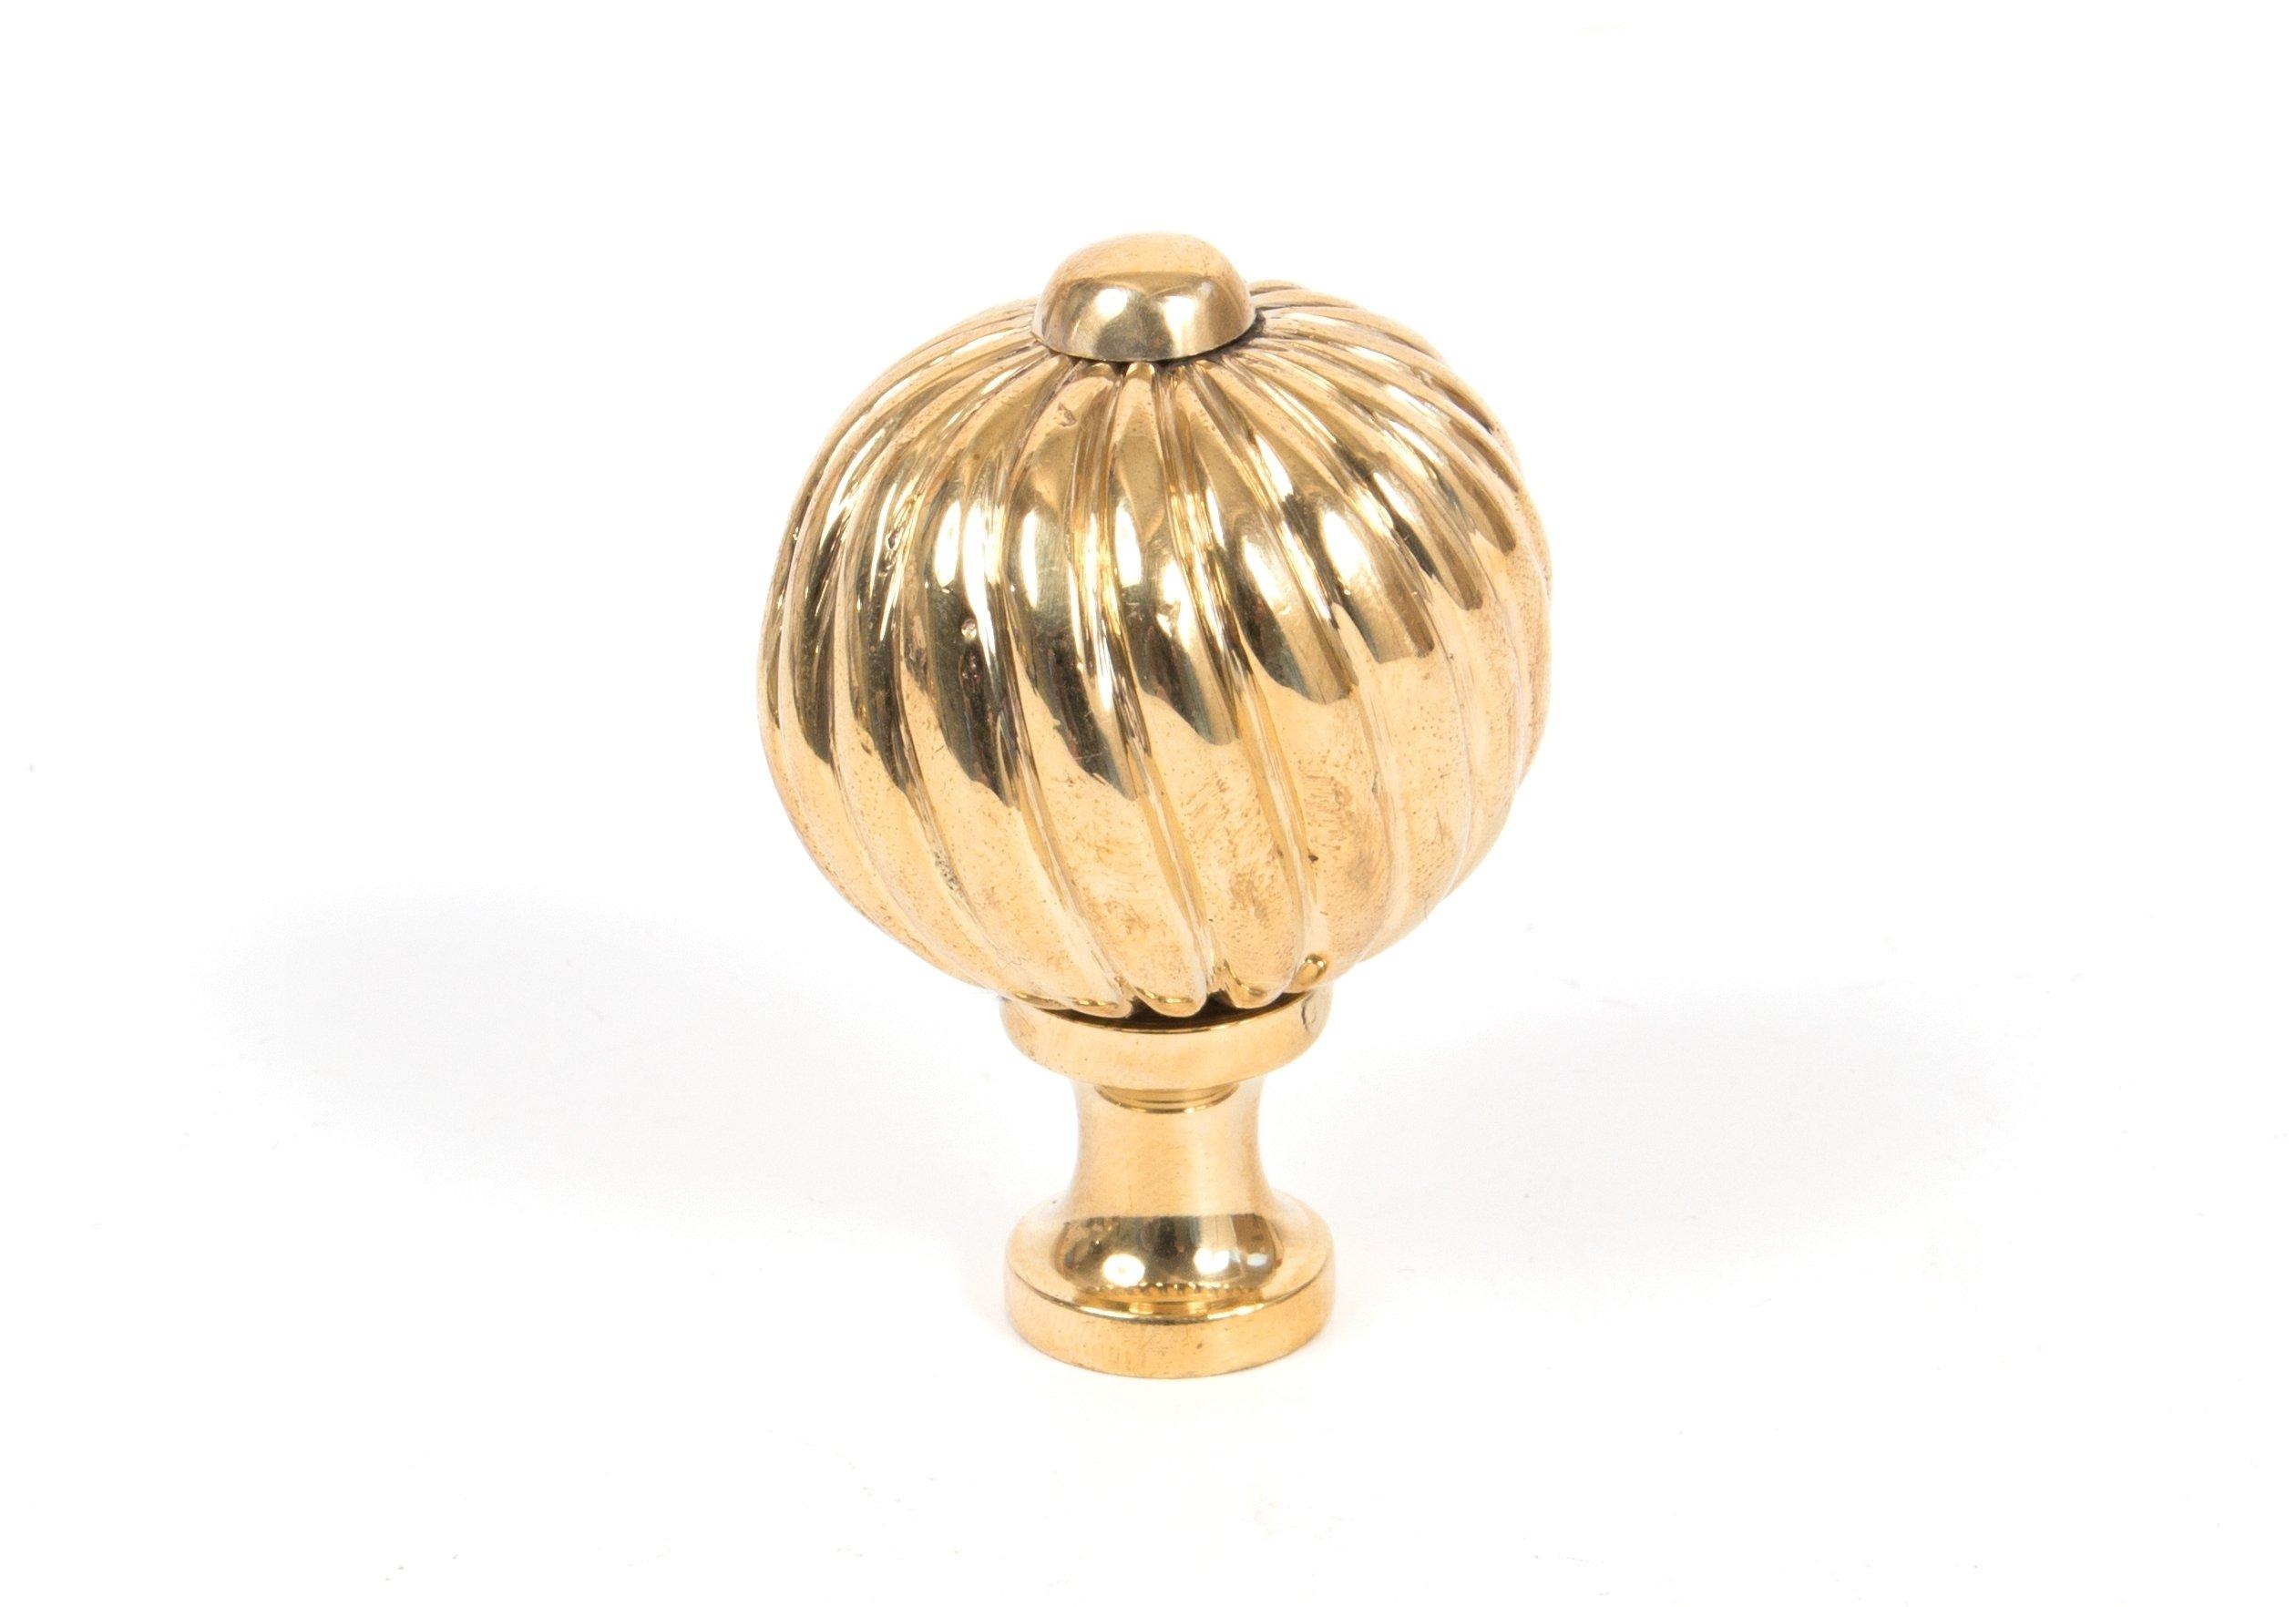 Polished Brass Spiral Cabinet Knob - Medium